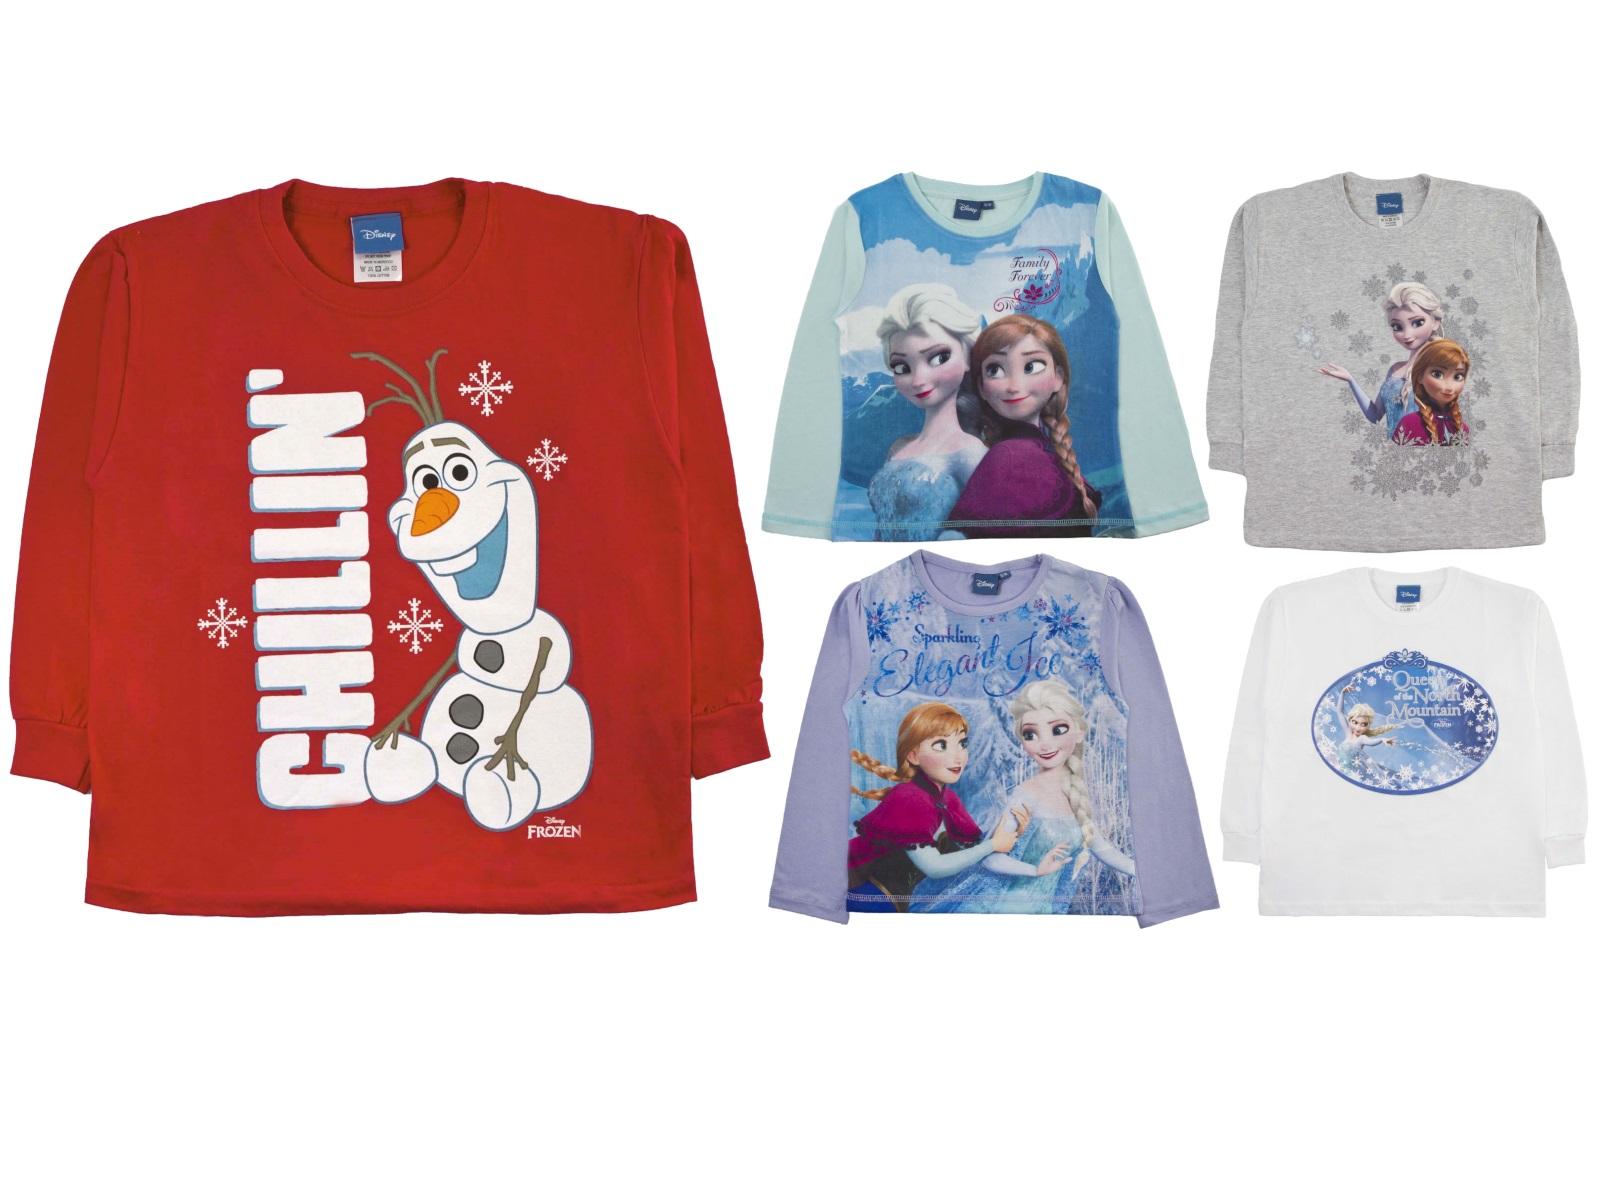 17ccf43a4 Disney Frozen Elsa Anna Olaf Long Sleeve T Shirt 100% Cotton Top Kids Size